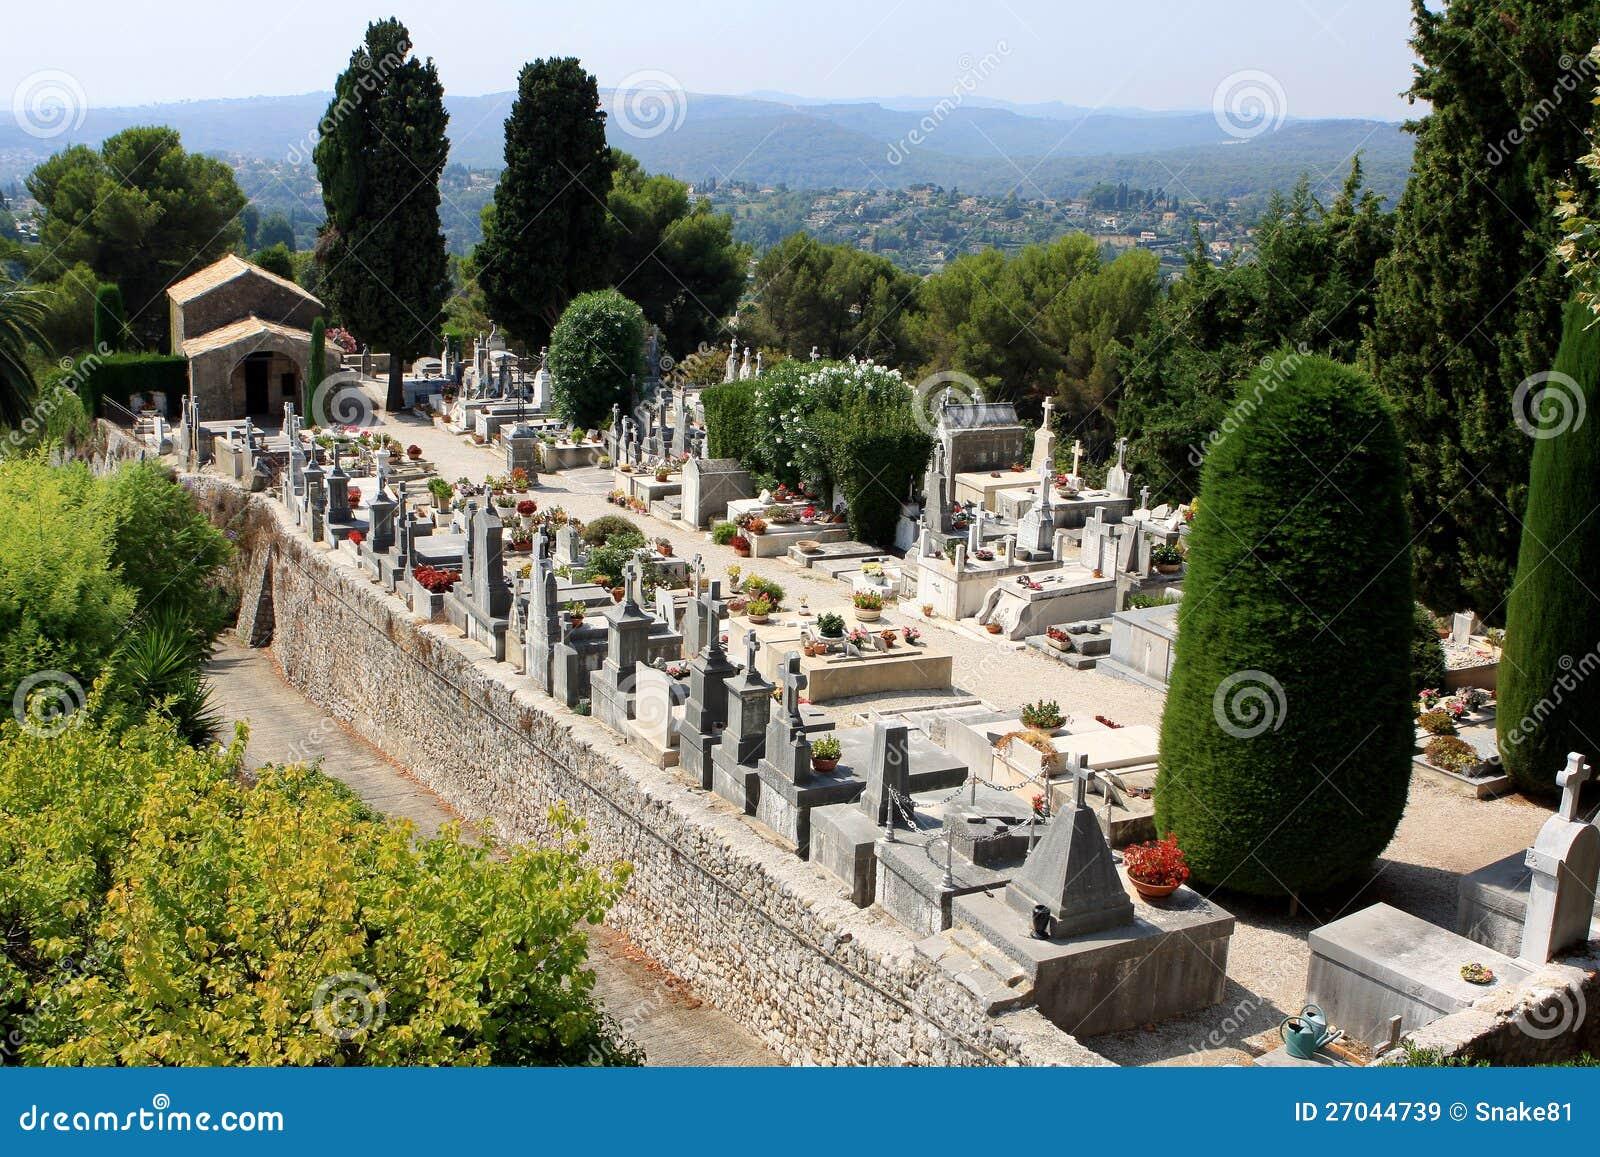 St paul de vence cemetery france stock image image of for Chagall st paul de vence